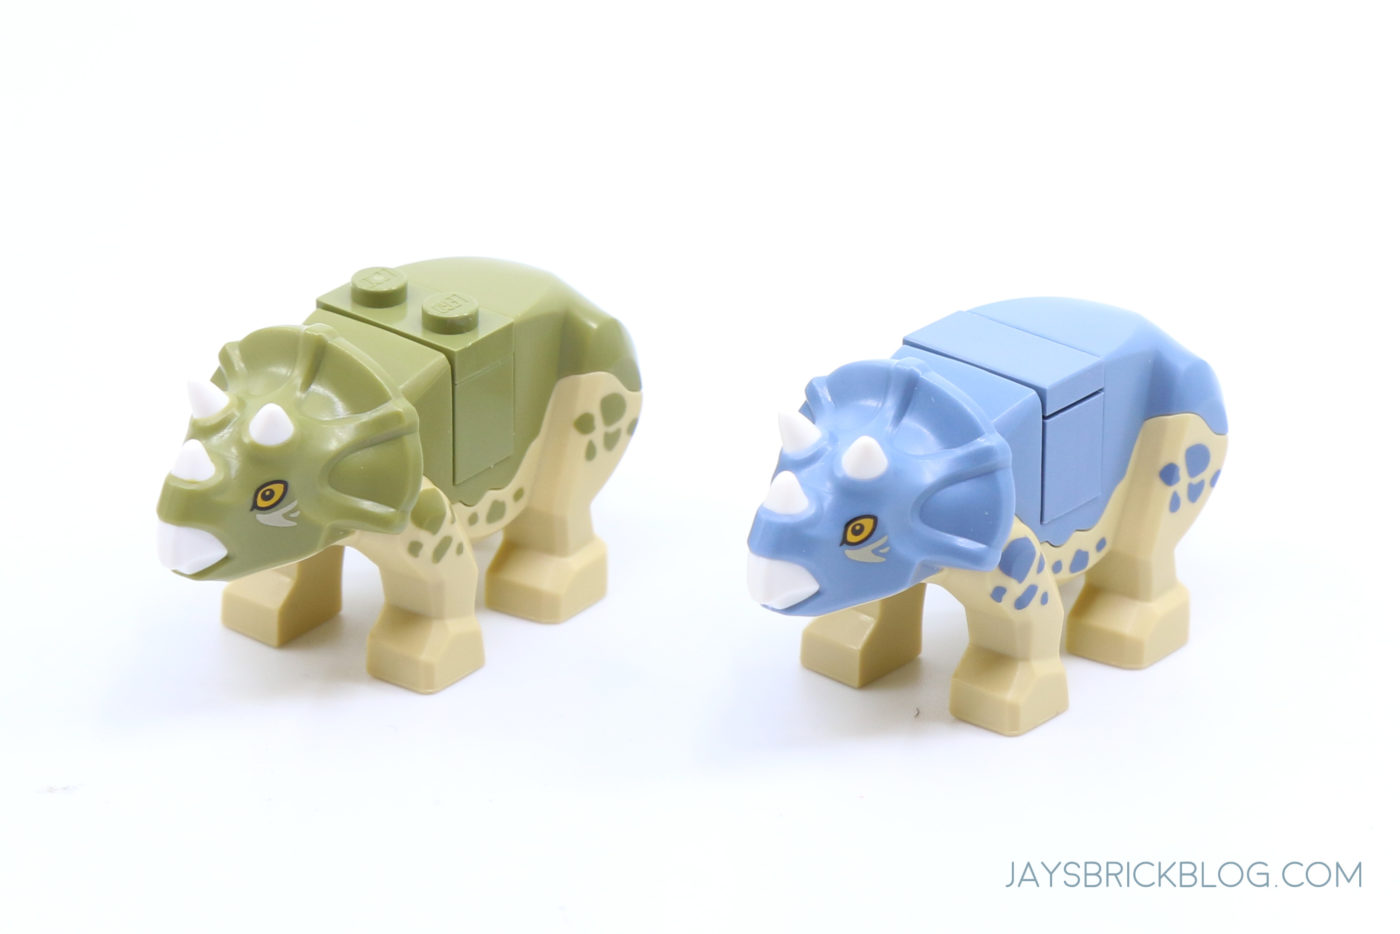 LEGO 76940 T. rex Dinosaur Fossil Exhibition Baby Triceratops Comparison